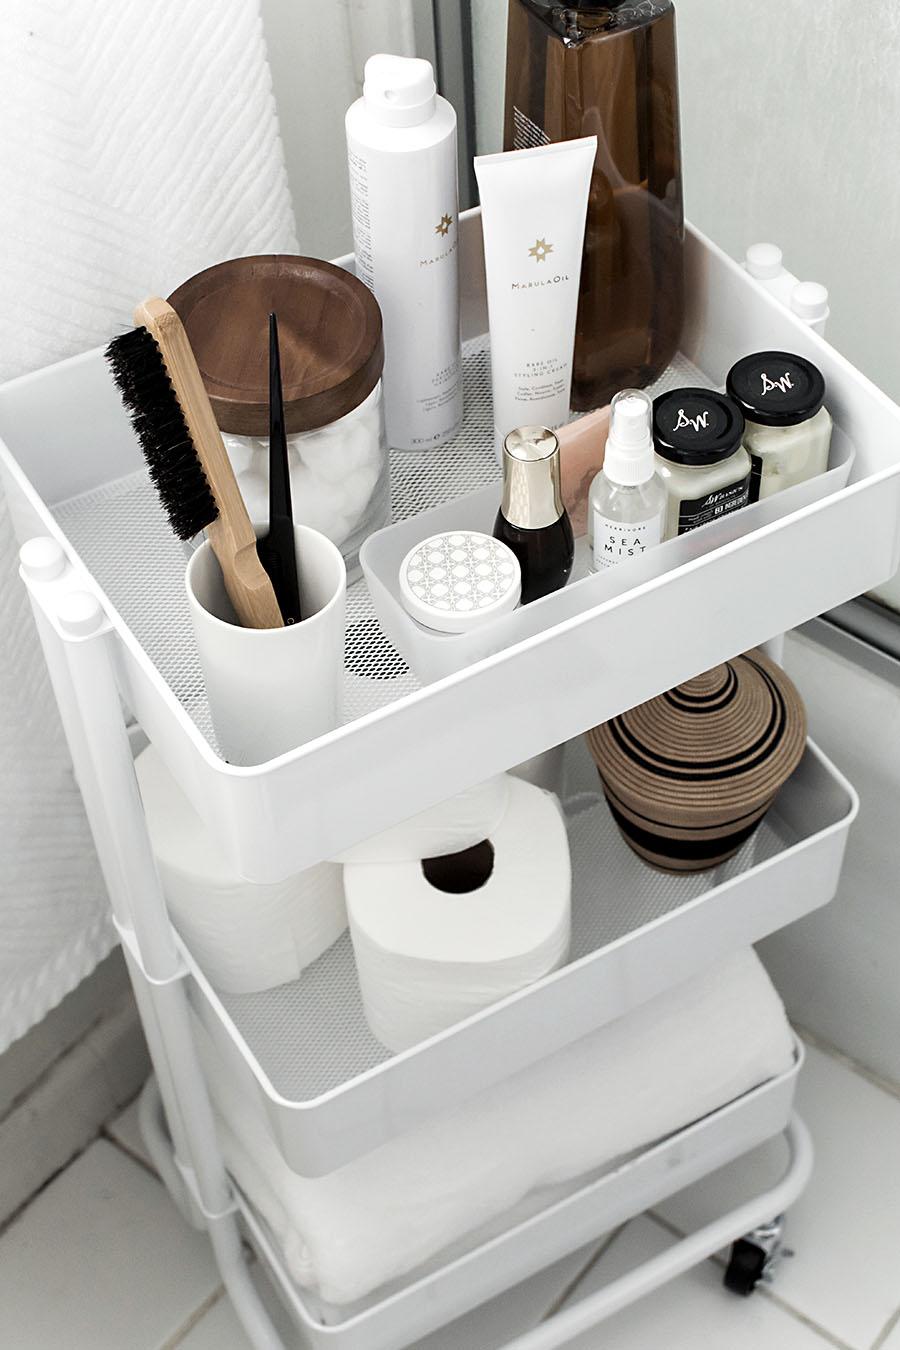 Bathroom make up storage idea